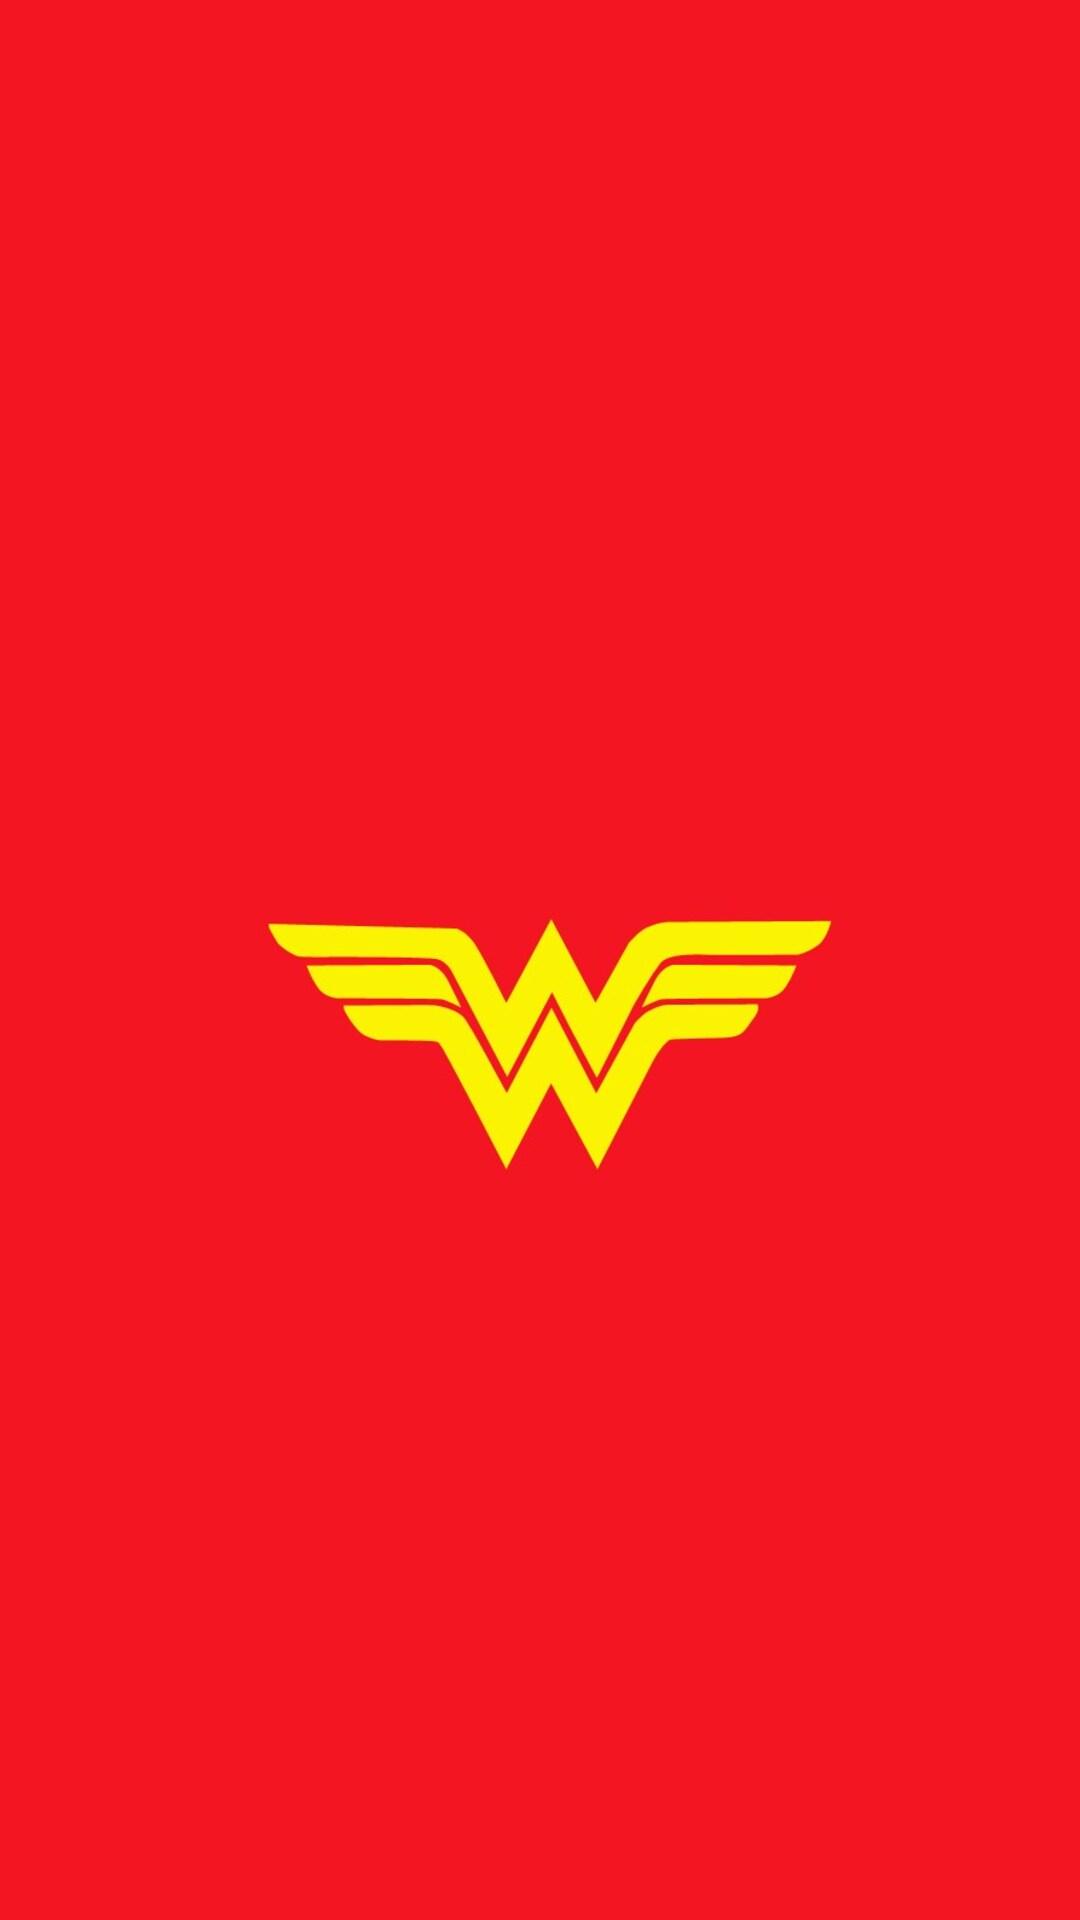 1080x1920 Wonder Woman Logo Iphone 7 6s 6 Plus Pixel Xl One Plus 3